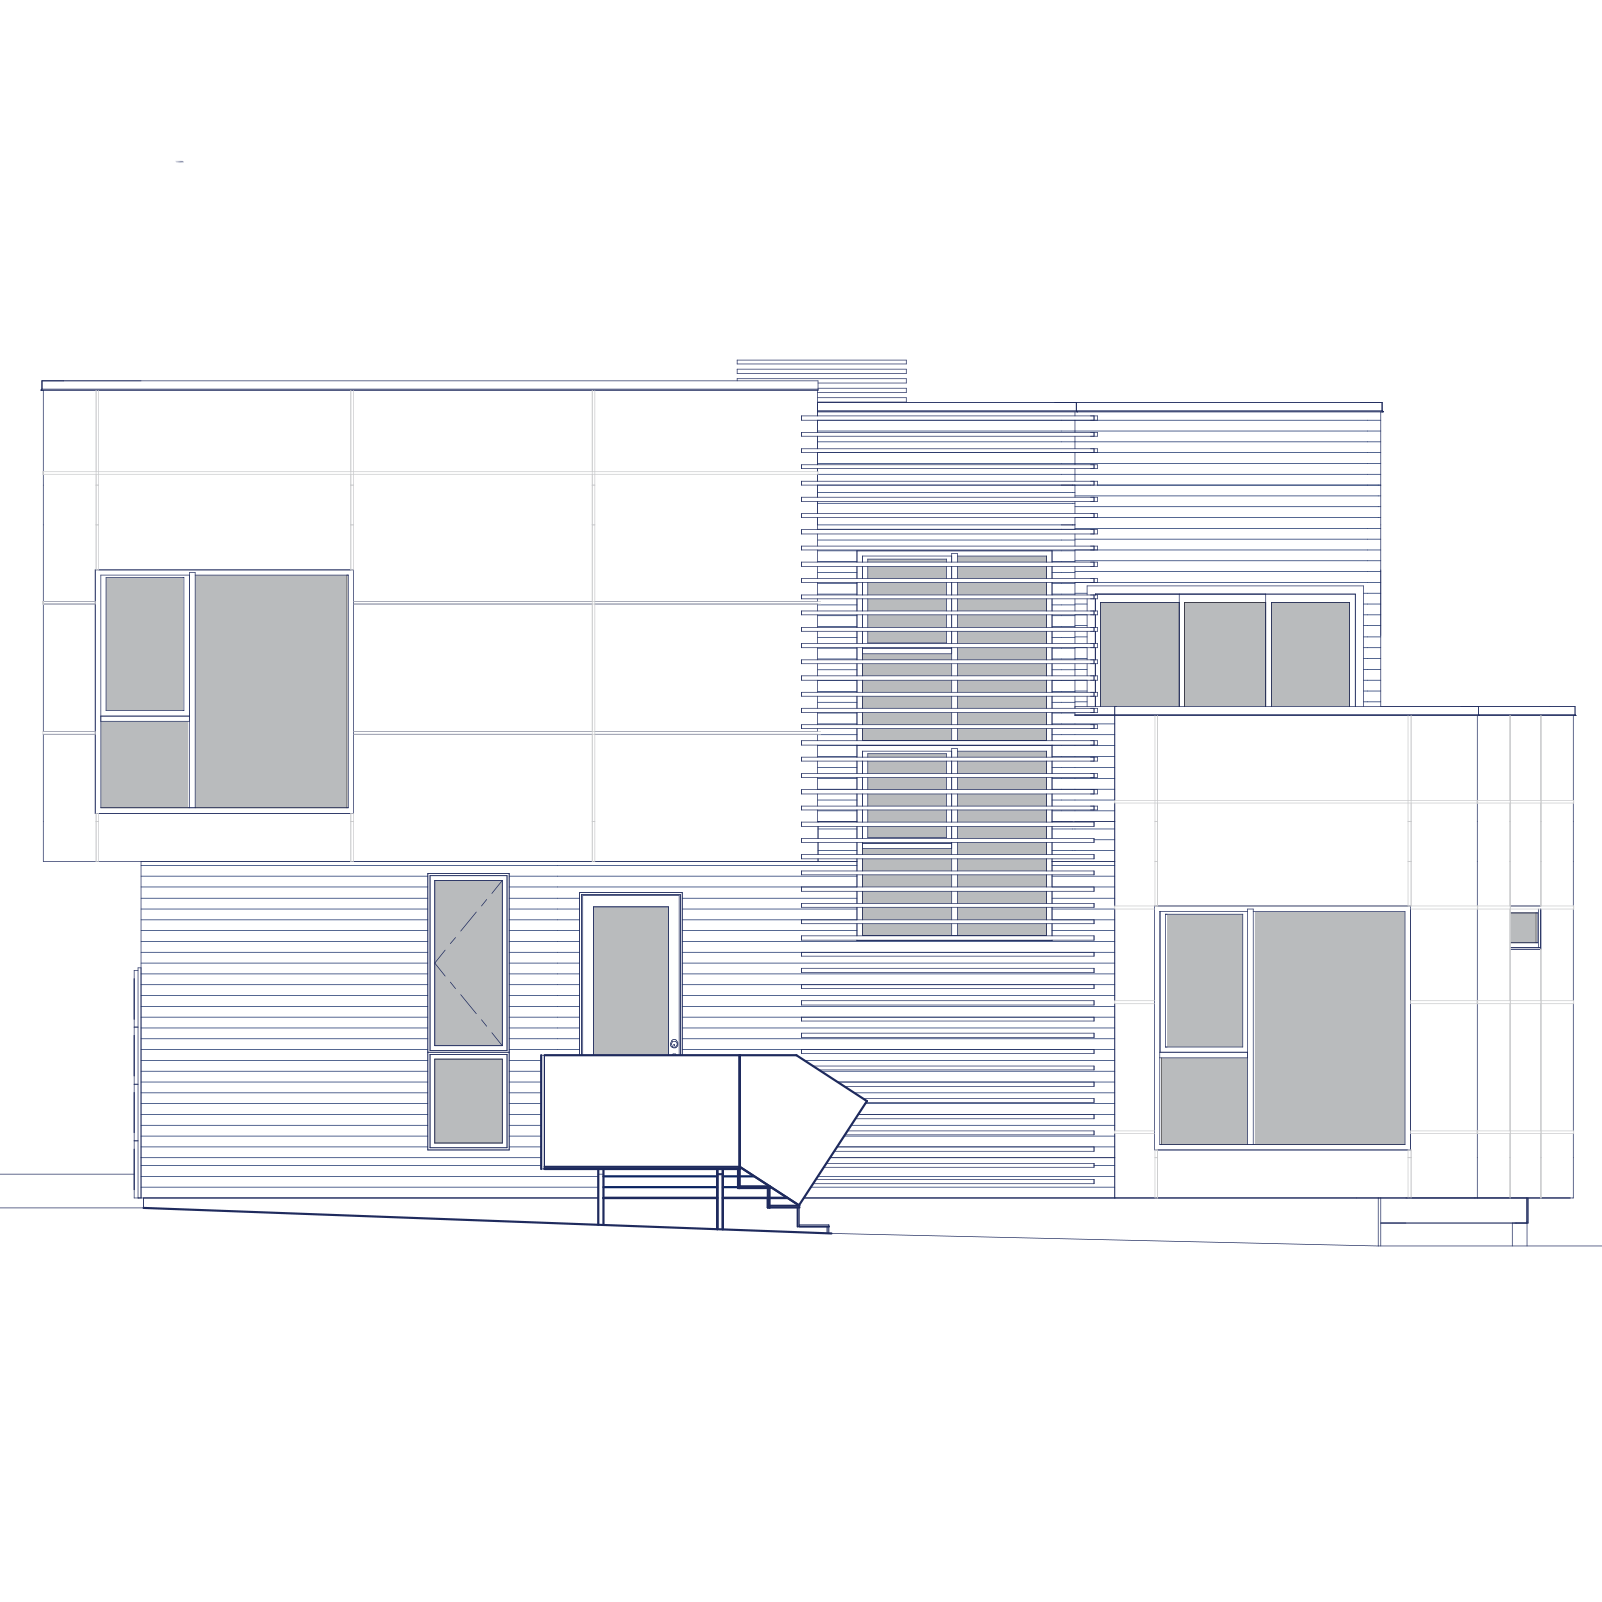 BRAEBURN - 3 OR 4 BEDROOM3 FULL + 1 HALF BATH2483 SQUARE FEET